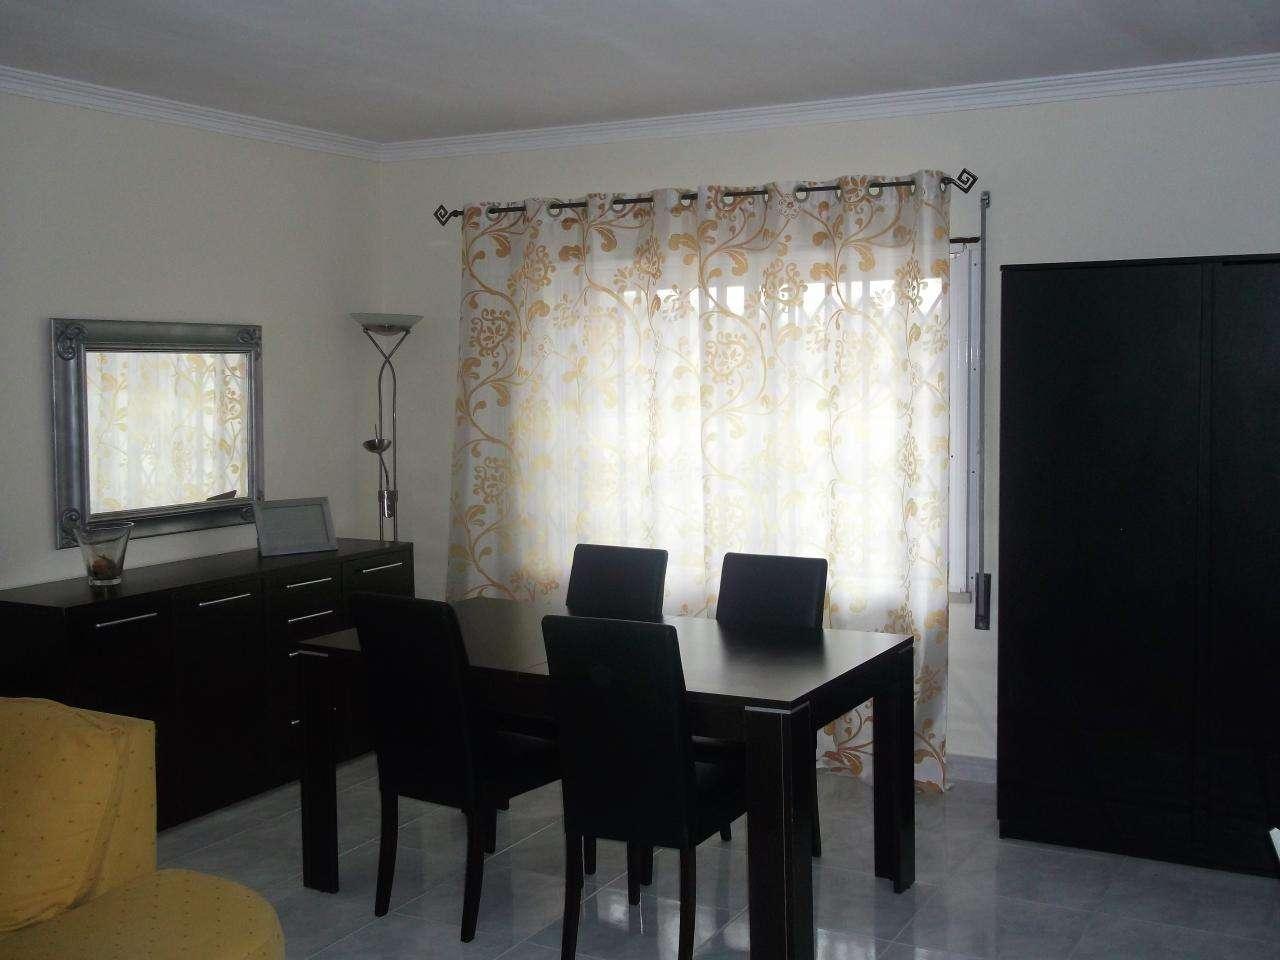 Apartamento para comprar, Ericeira, Mafra, Lisboa - Foto 3